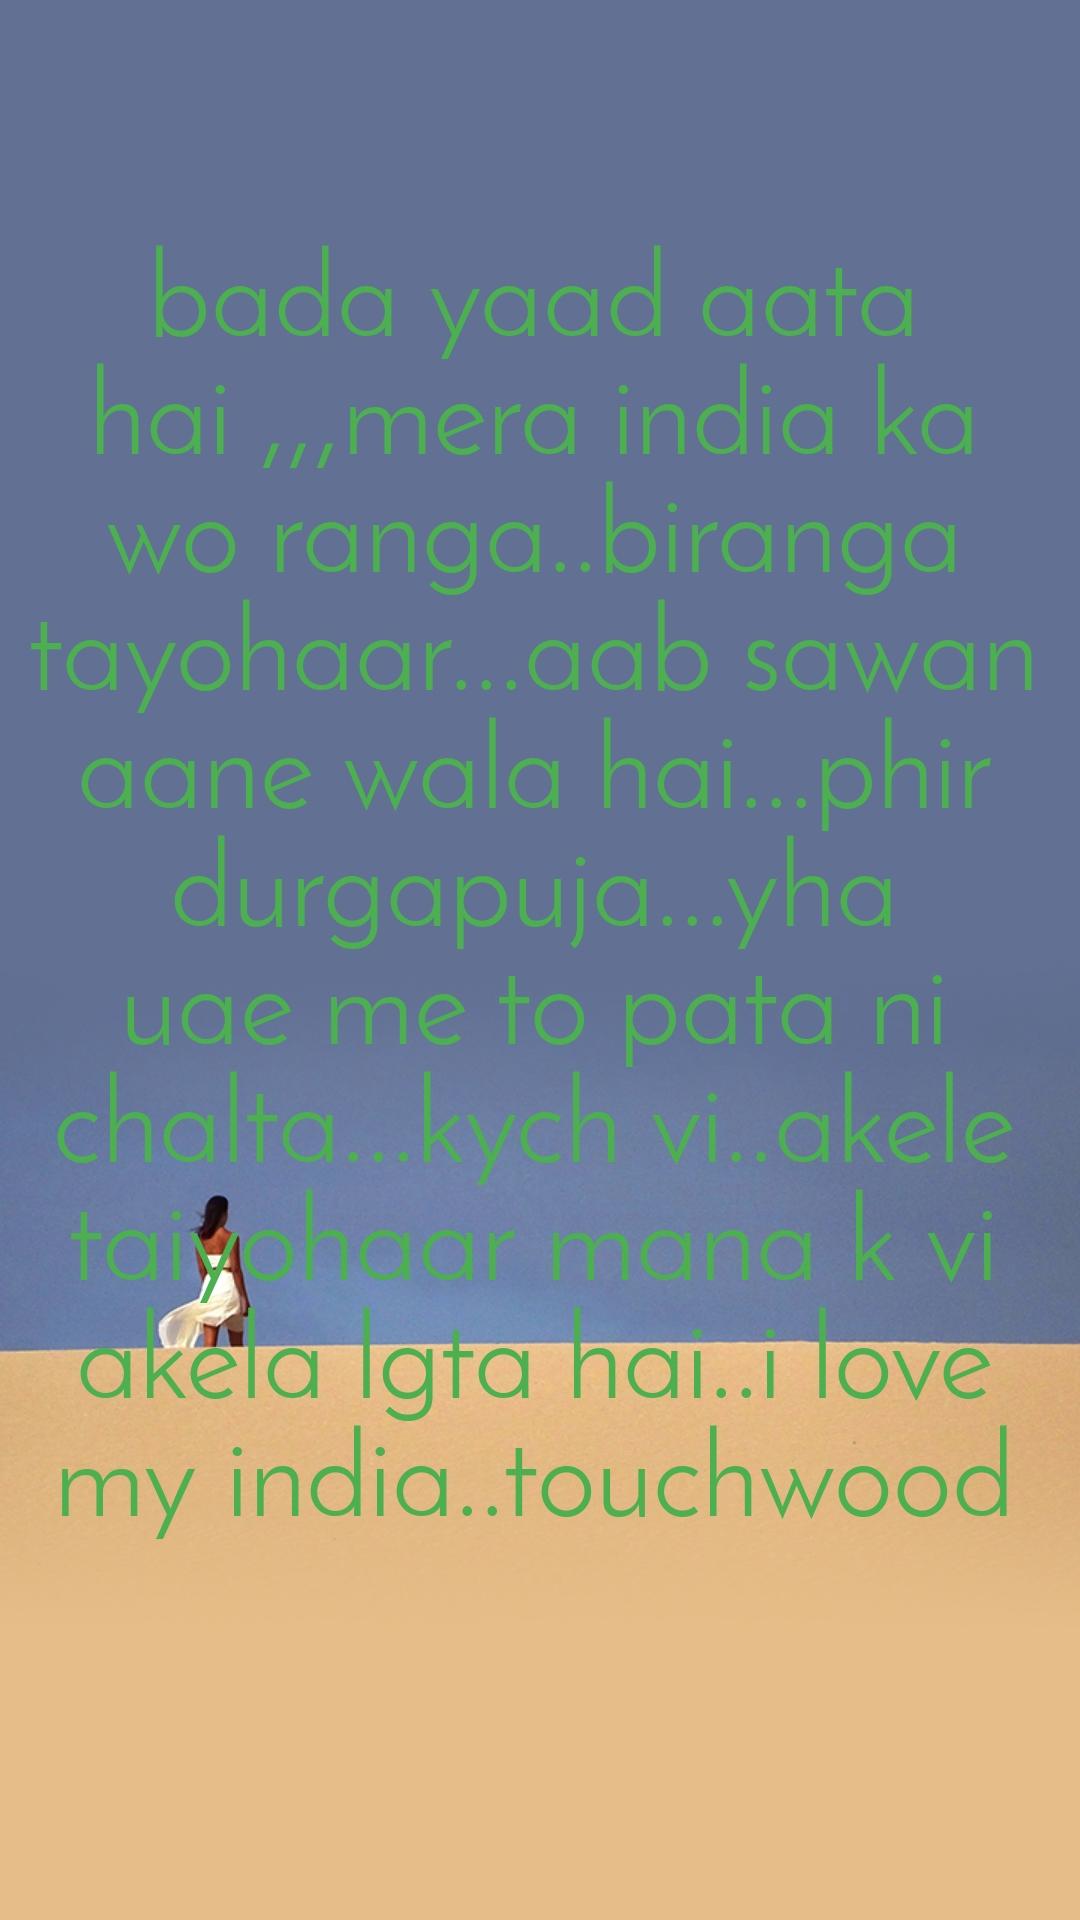 bada yaad aata hai ,,,mera india ka wo ranga..biranga tayohaar...aab sawan aane wala hai...phir durgapuja...yha uae me to pata ni chalta...kych vi..akele taiyohaar mana k vi akela lgta hai..i love my india..touchwood